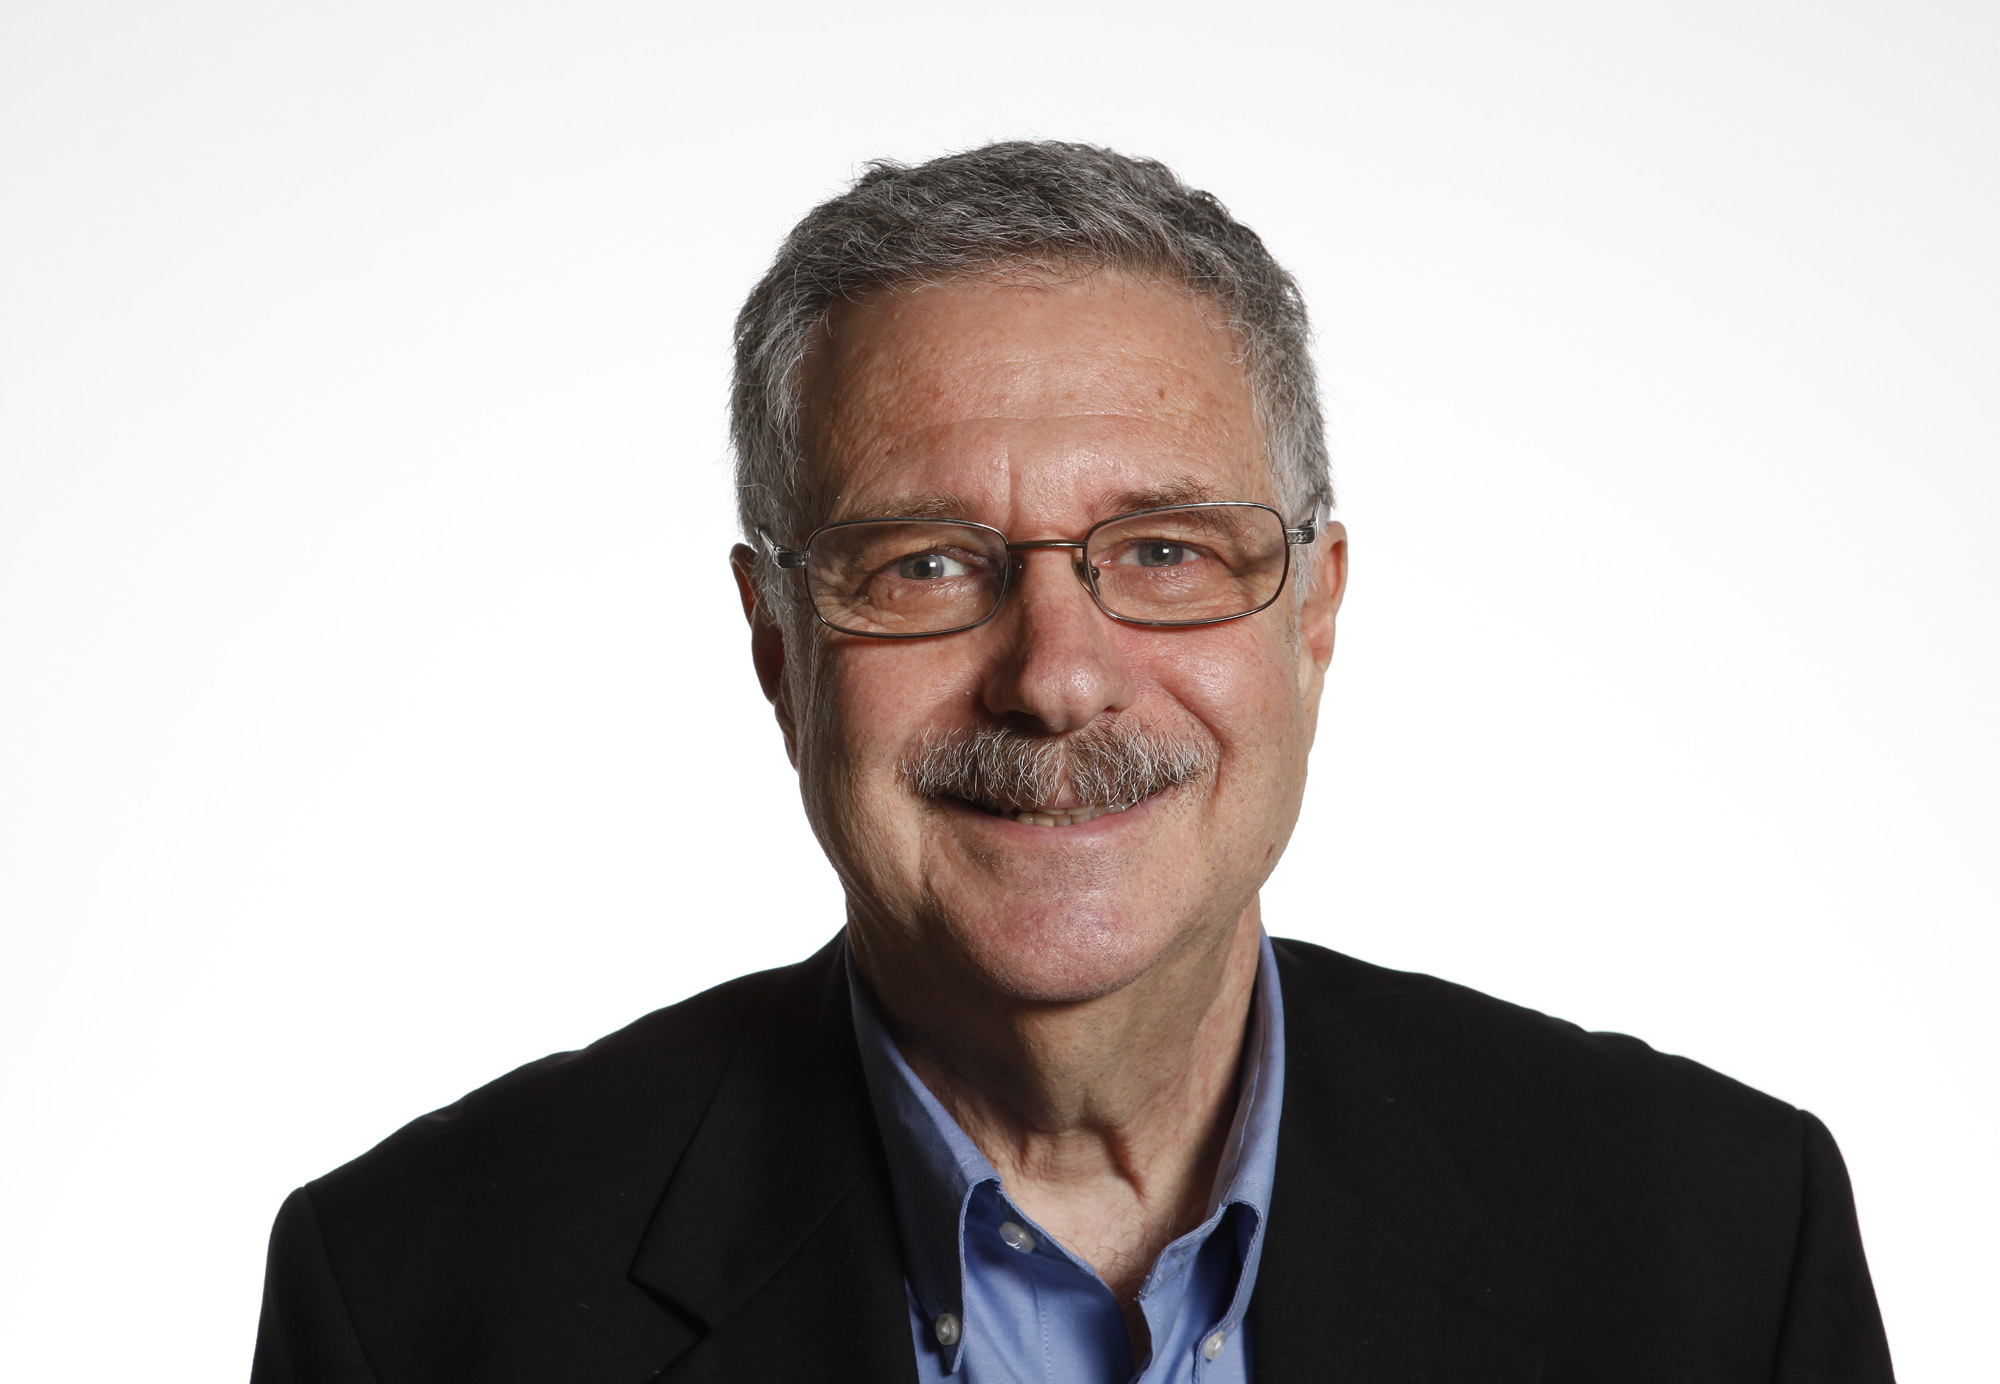 Larry Magid, freelance technology columnist of the San Jose Mercury News is photographed on Friday, Oct. 21, 2011 in San Jose. (Gary Reyes / Mercury News)